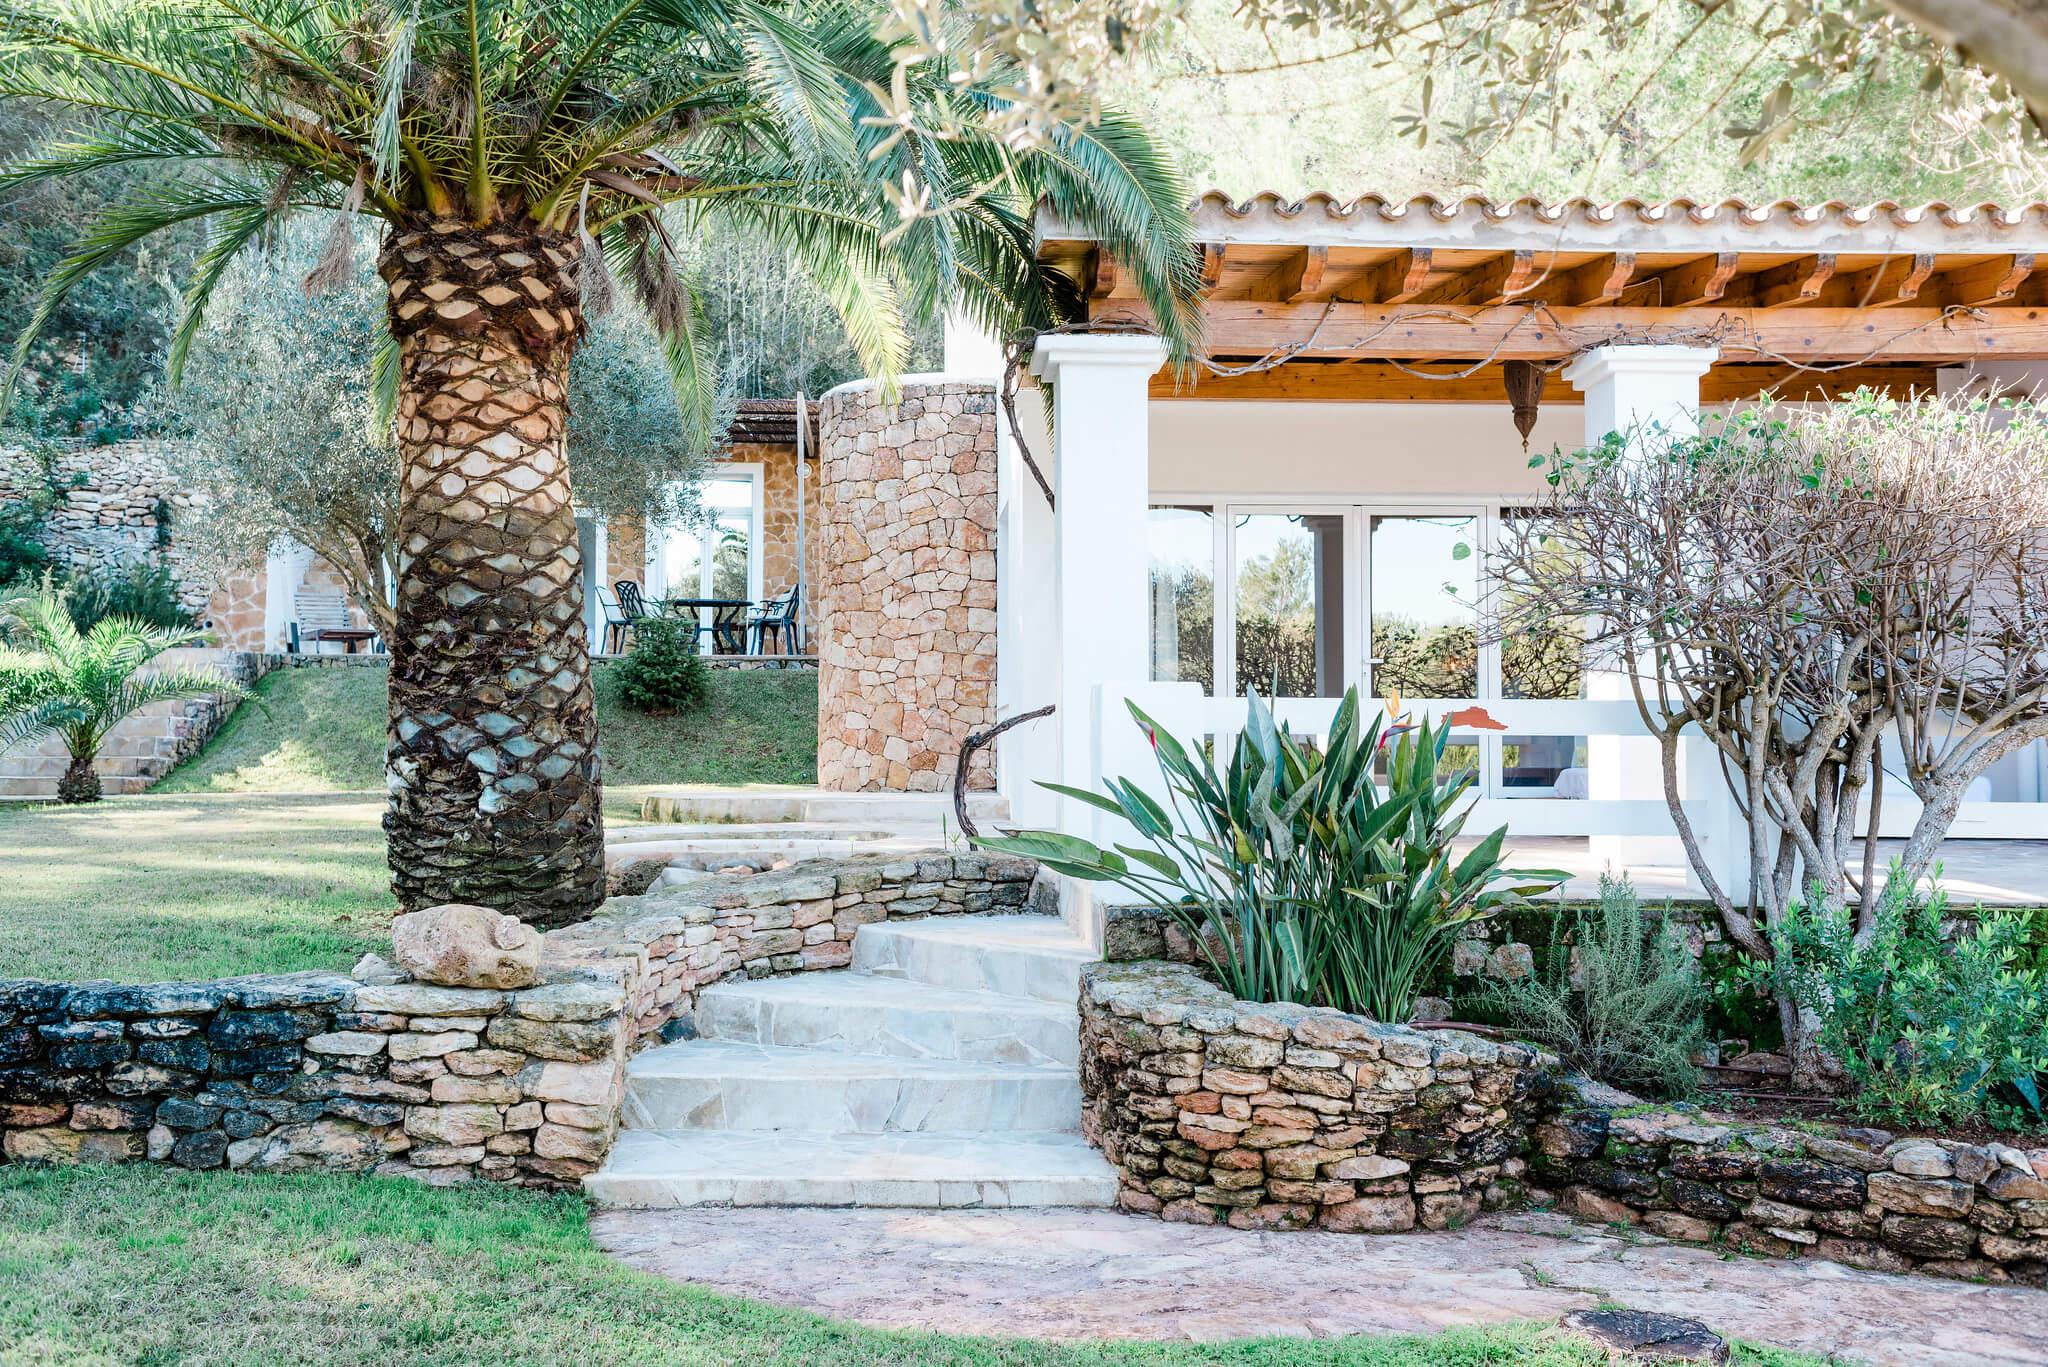 https://www.white-ibiza.com/wp-content/uploads/2020/05/white-ibiza-villas-can-verde-exterior-outside-master.jpg